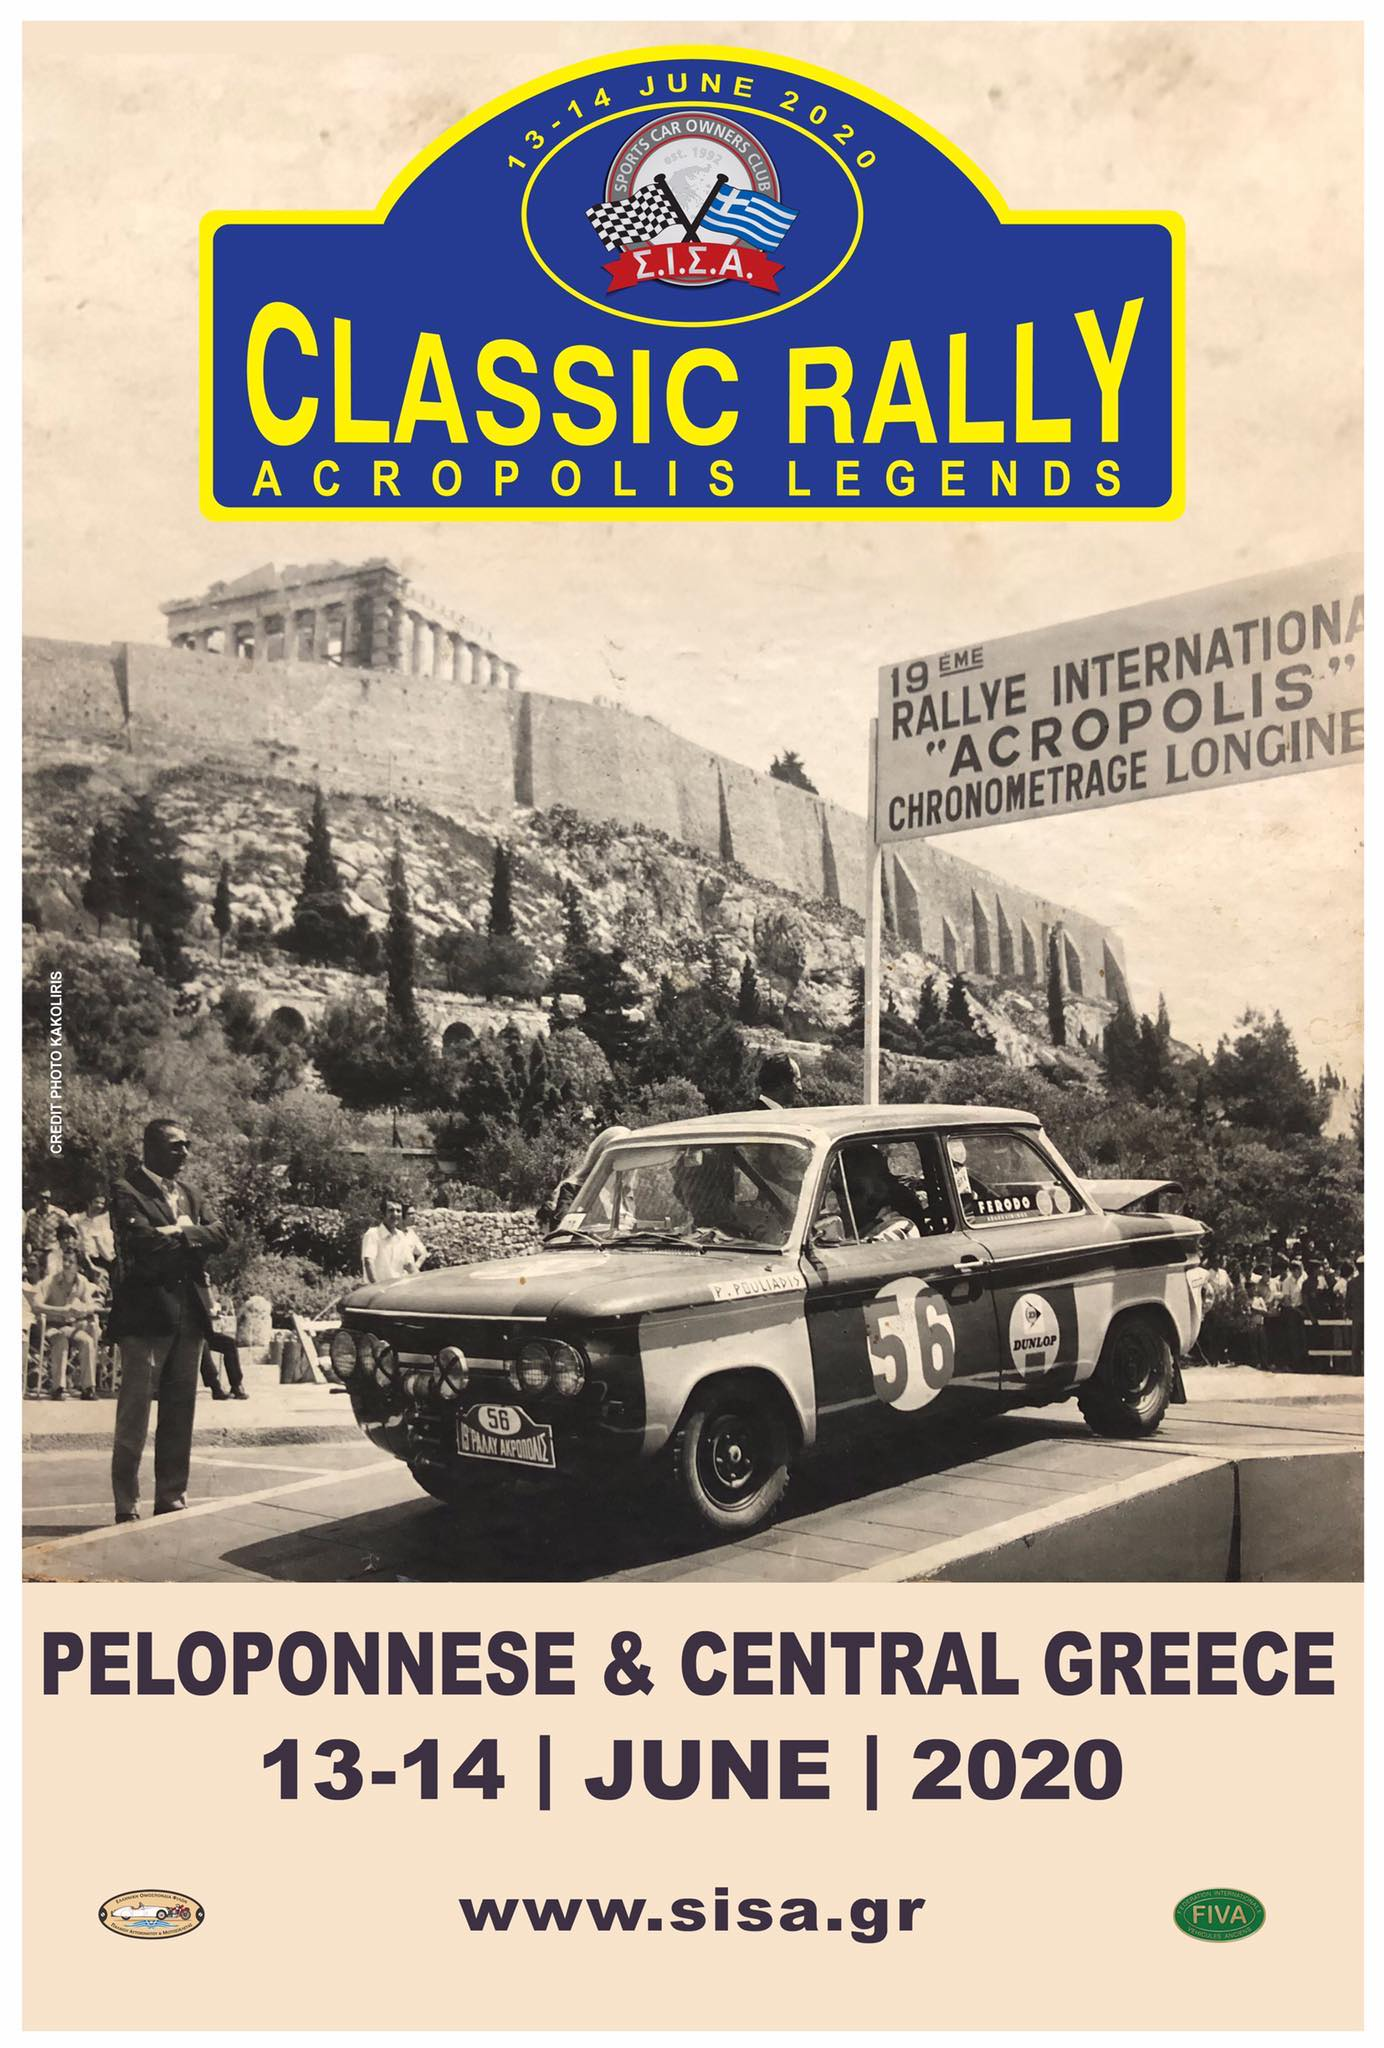 Classic Rally Acropolis Legends